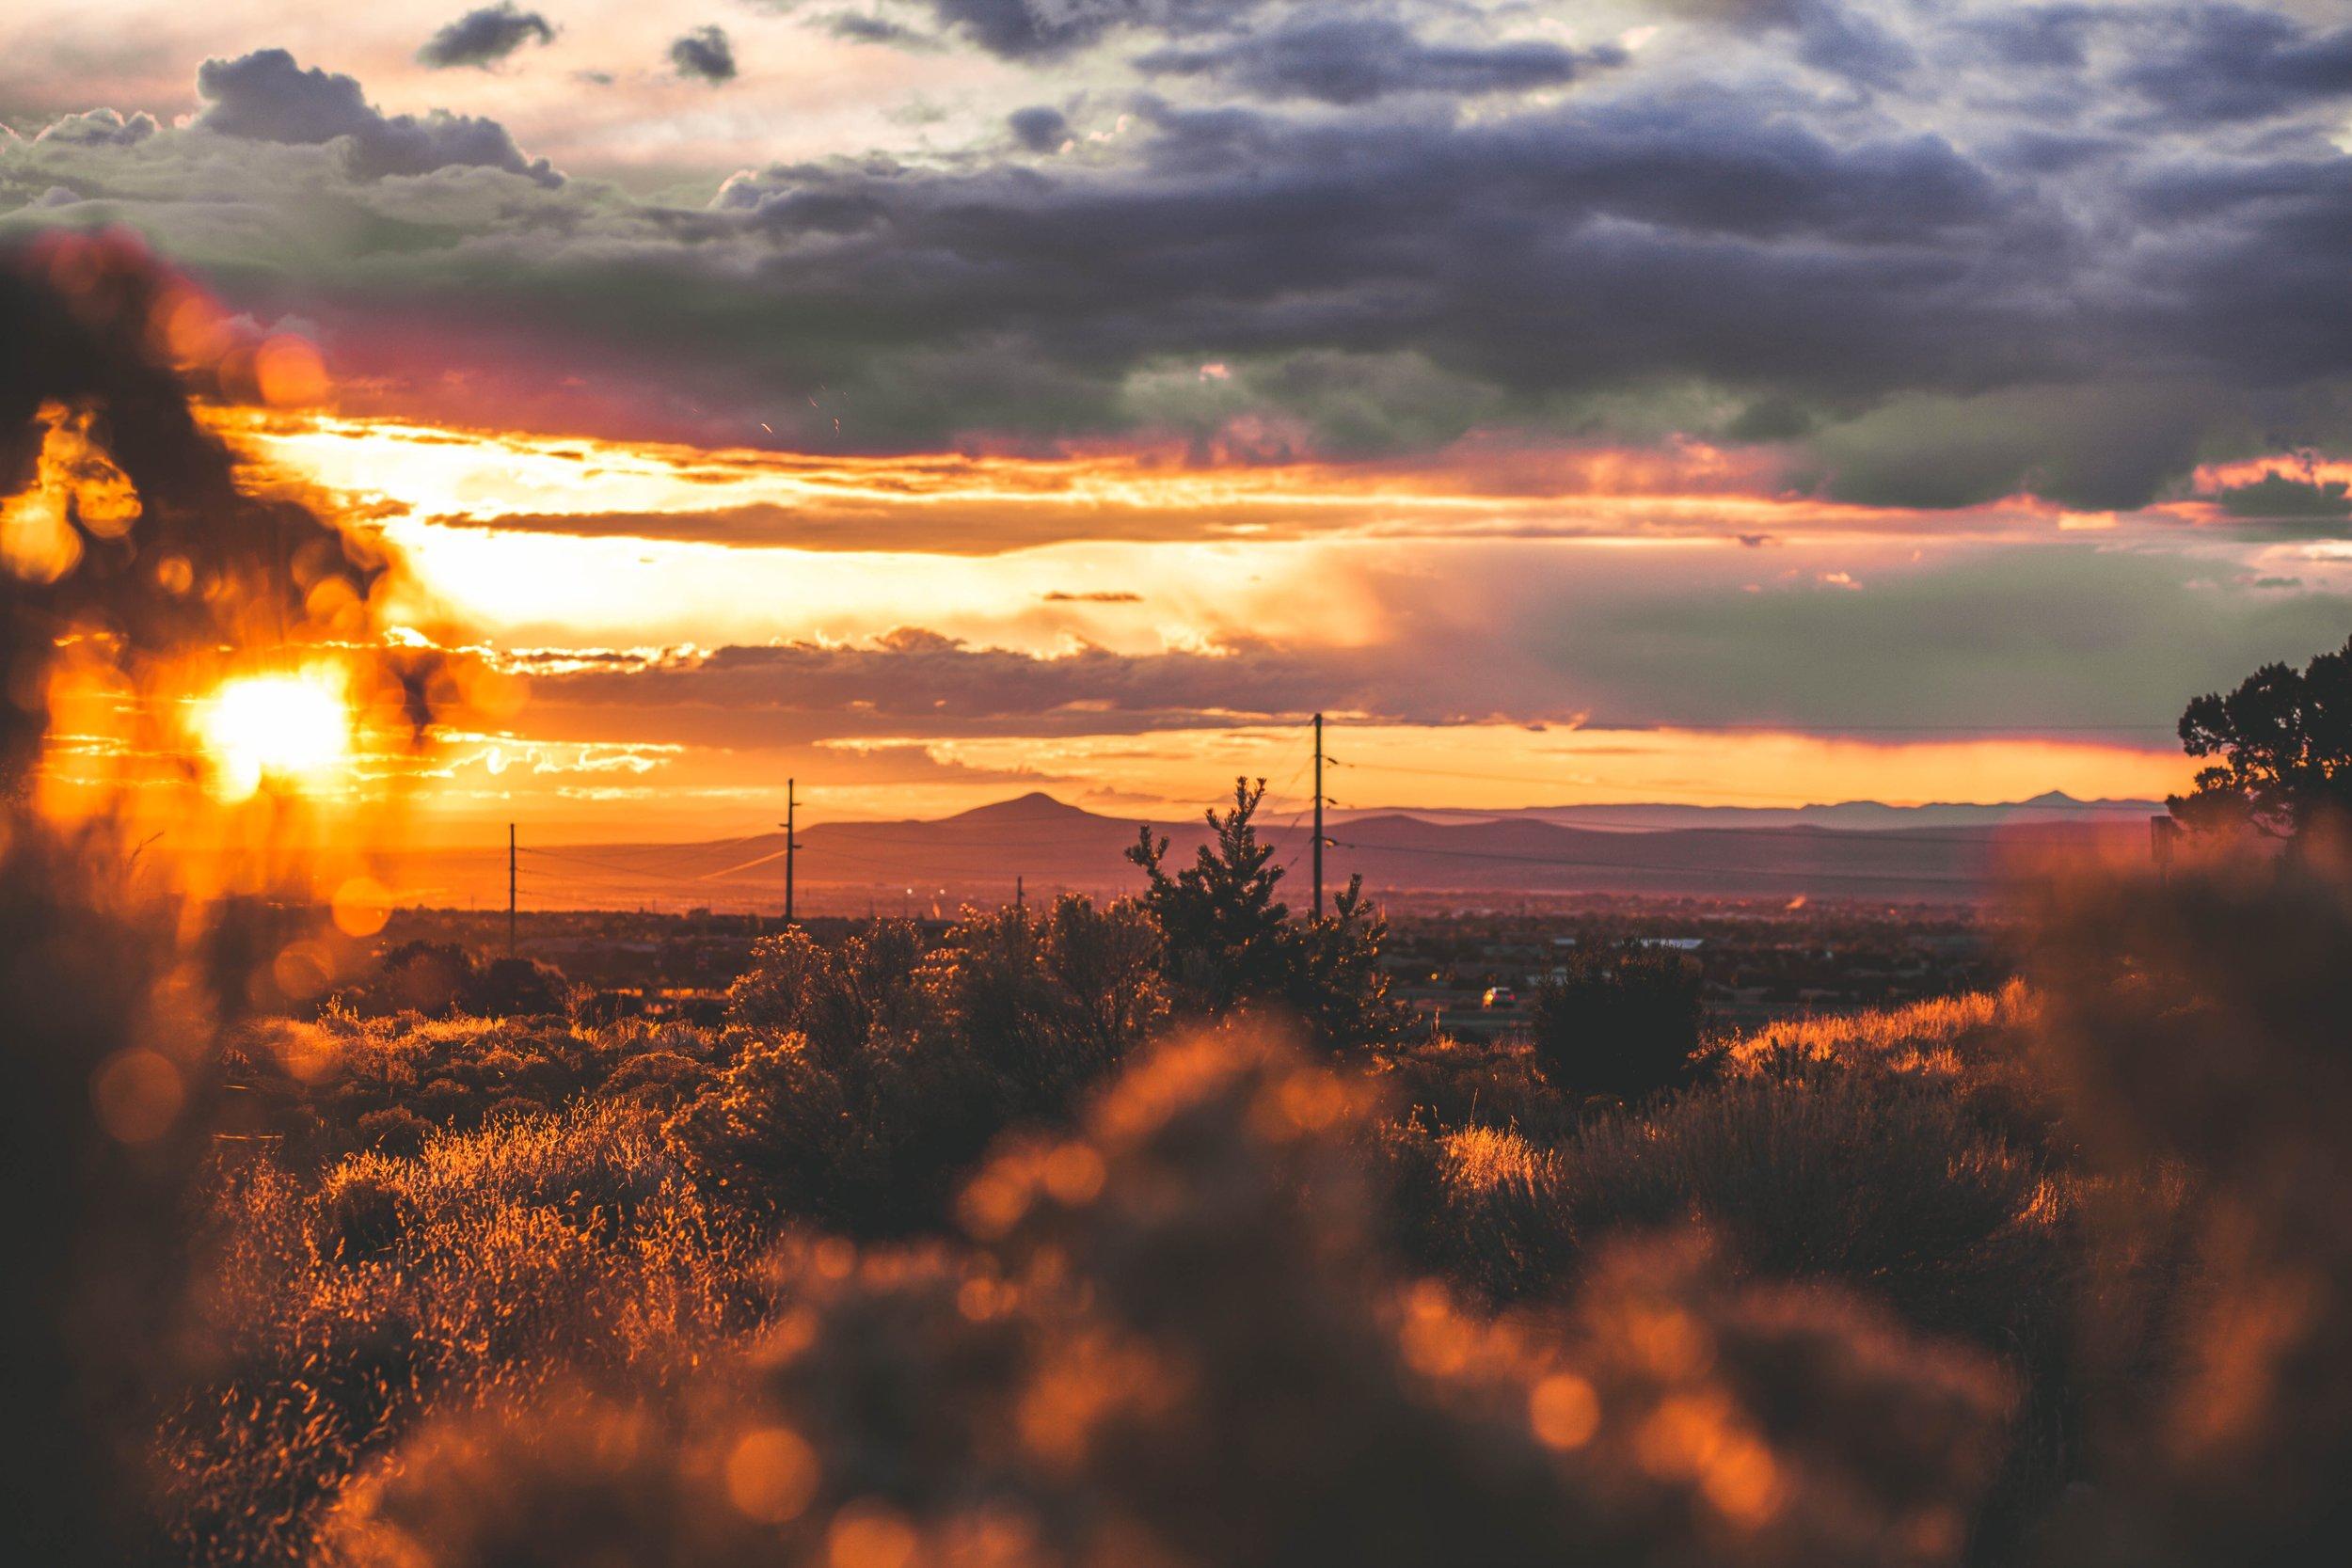 Santa Fe Sunset. Photo by  Maddy Baker  on  Unsplash